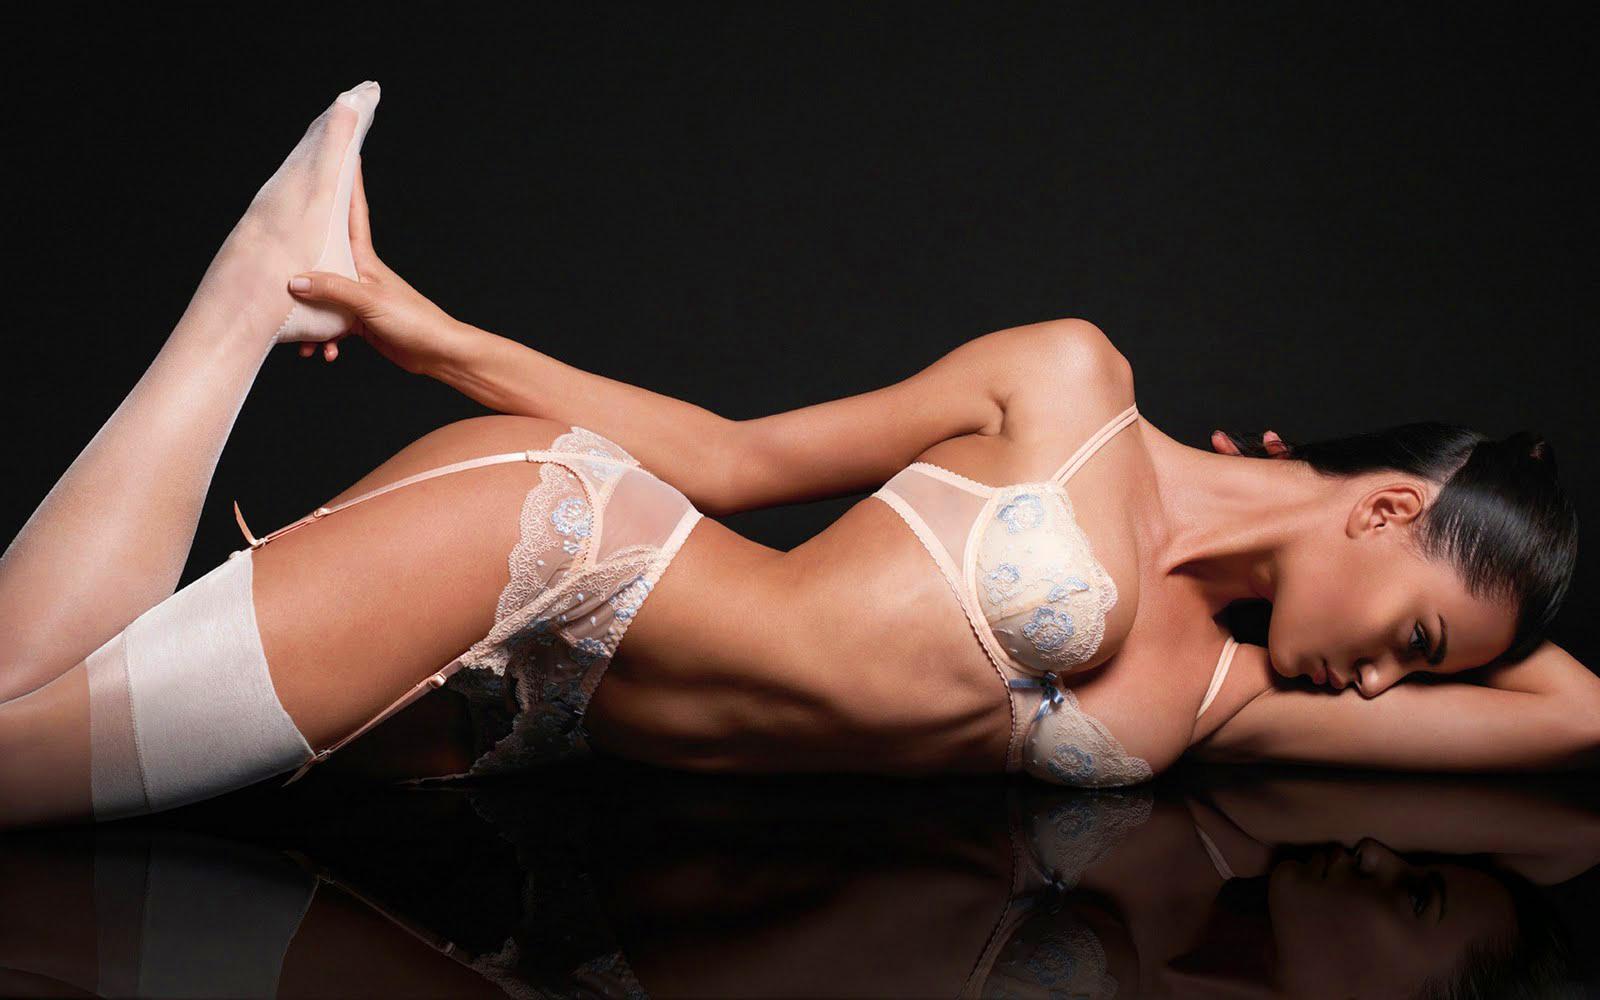 wallpapershdsize: Models Wallpapers - Sexy Models - Under Garments Wallpapers